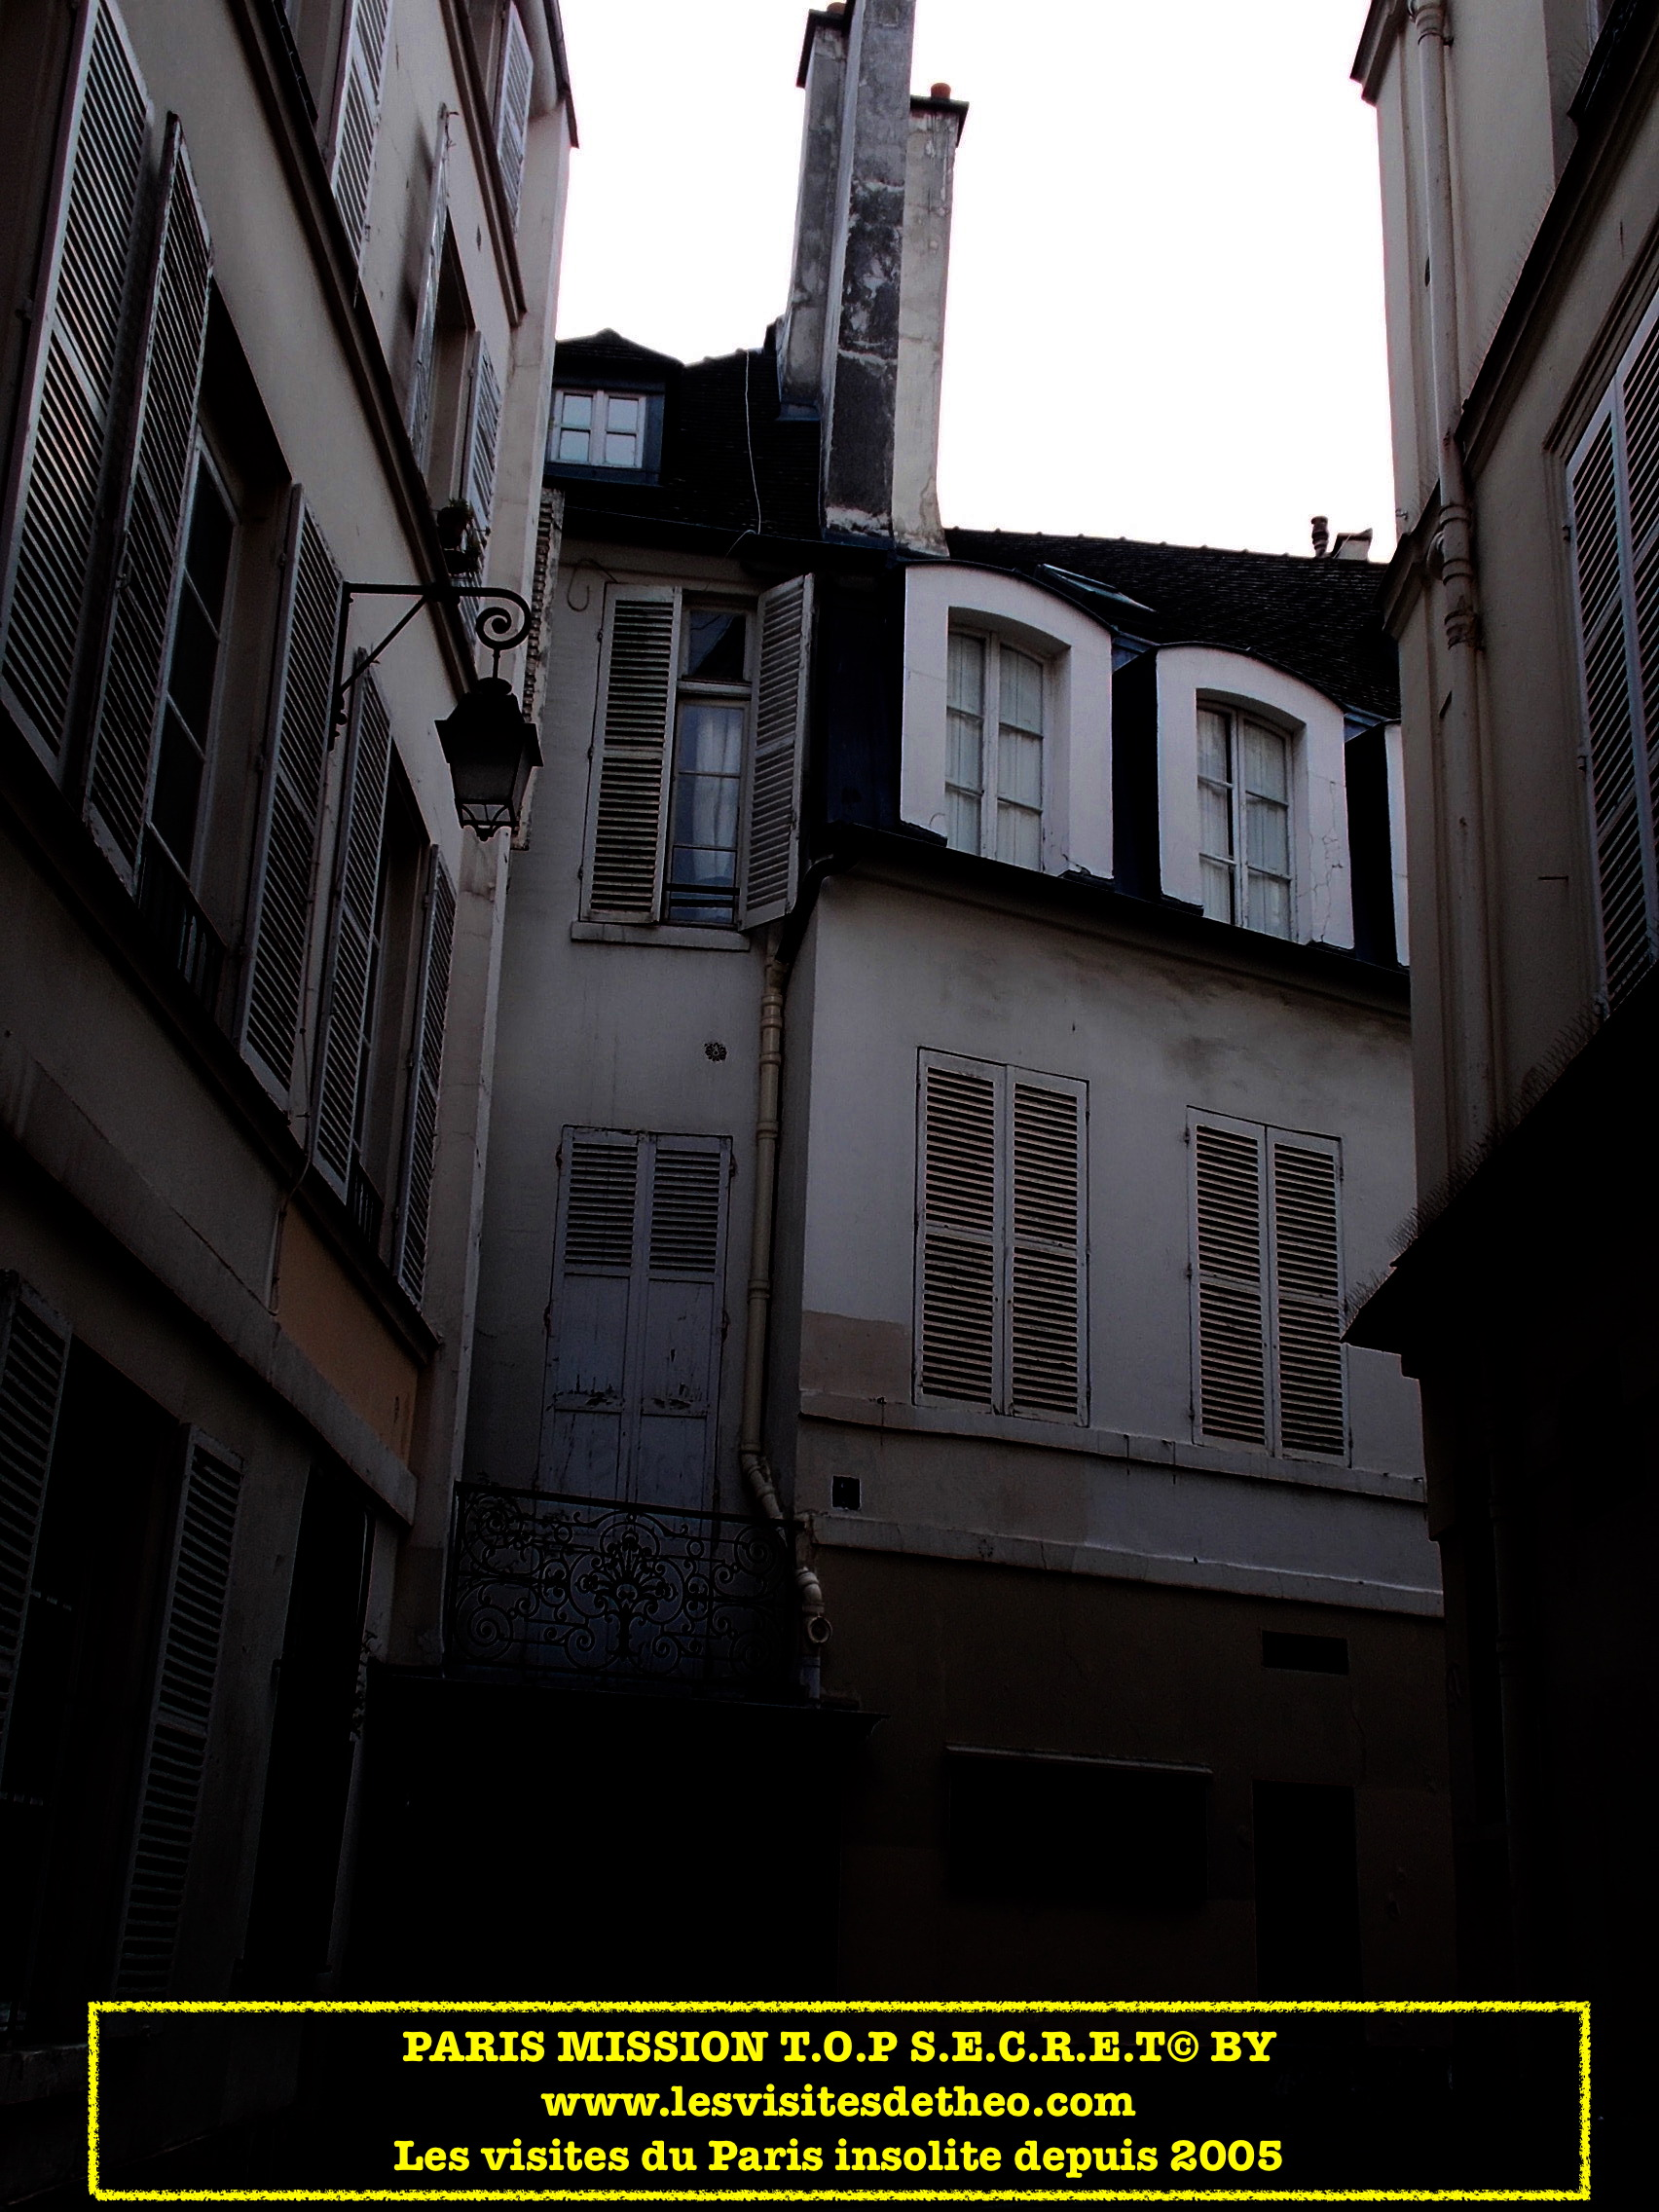 Paris MISSION T.O.P. S.E.C.R.E.T.   ACTE I